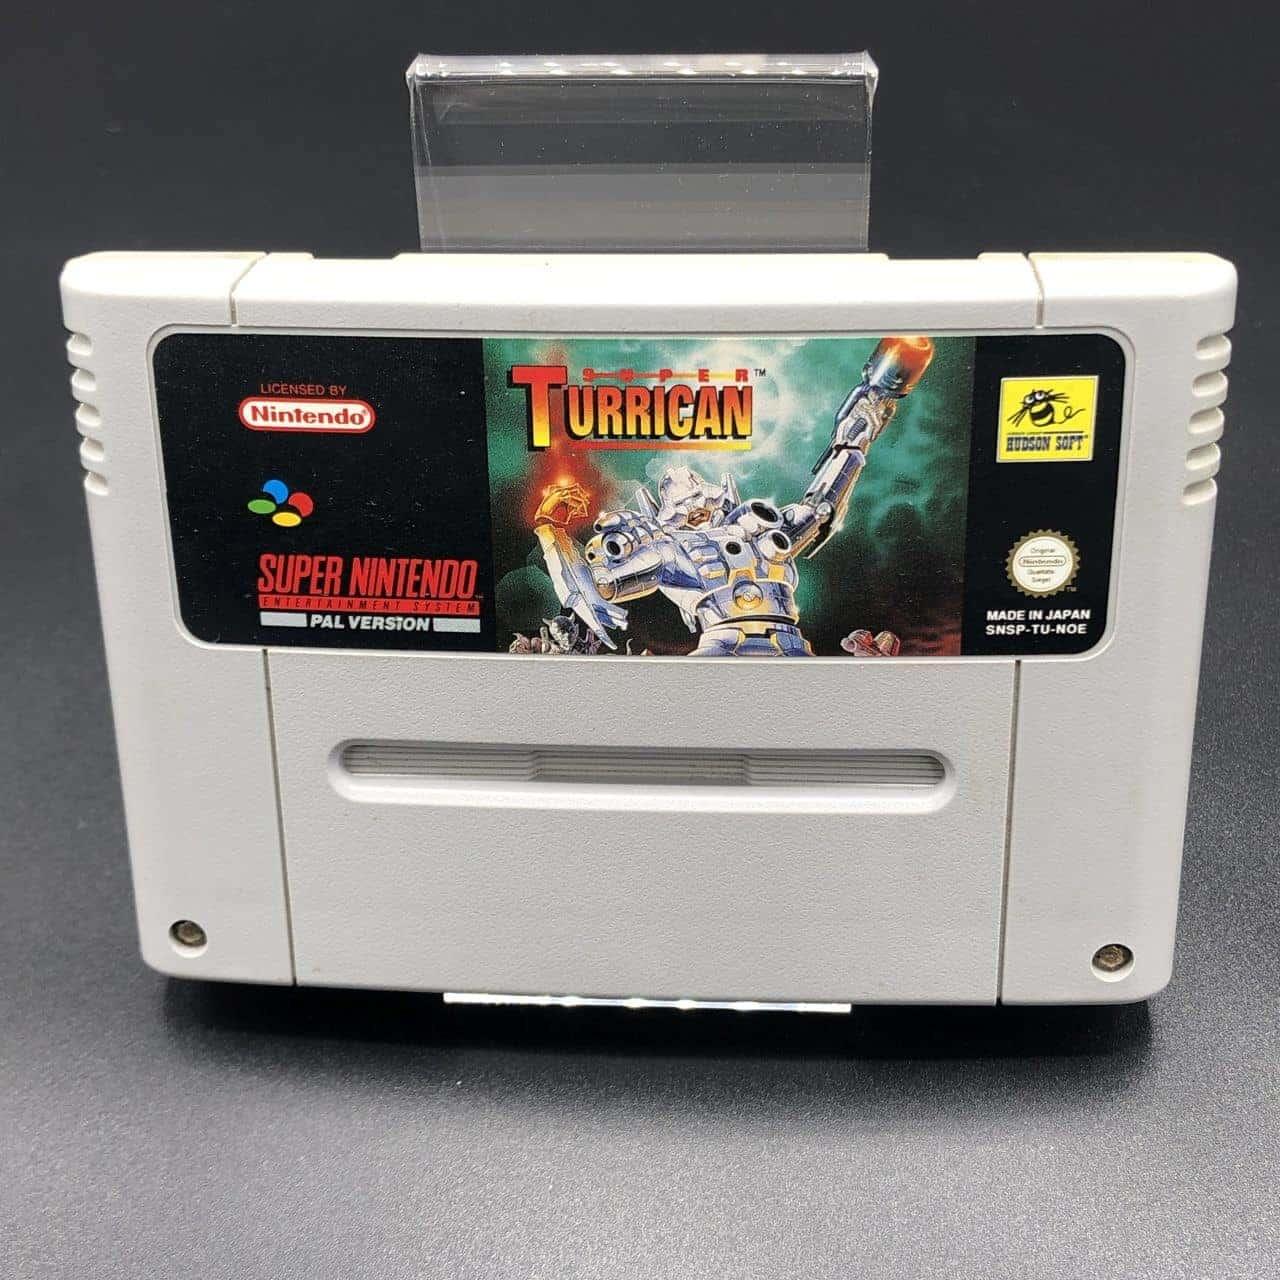 SNES Super Turrican (Modul) (Gut) Super Nintendo